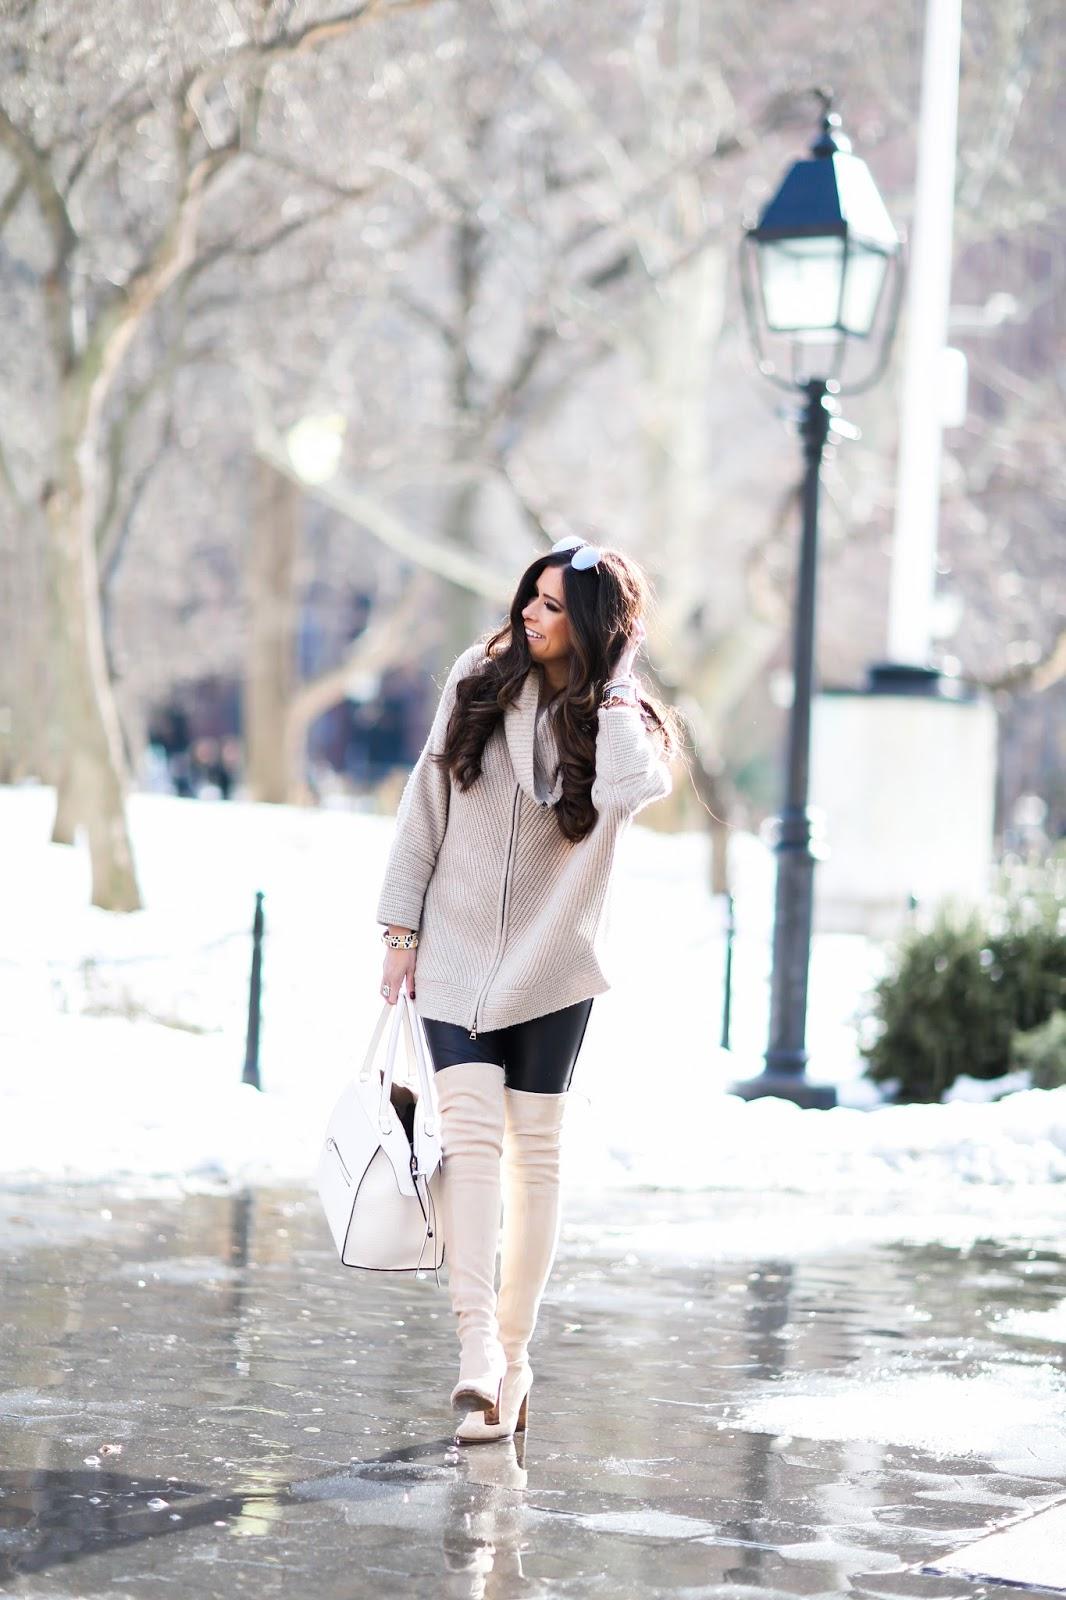 celine white leather bag